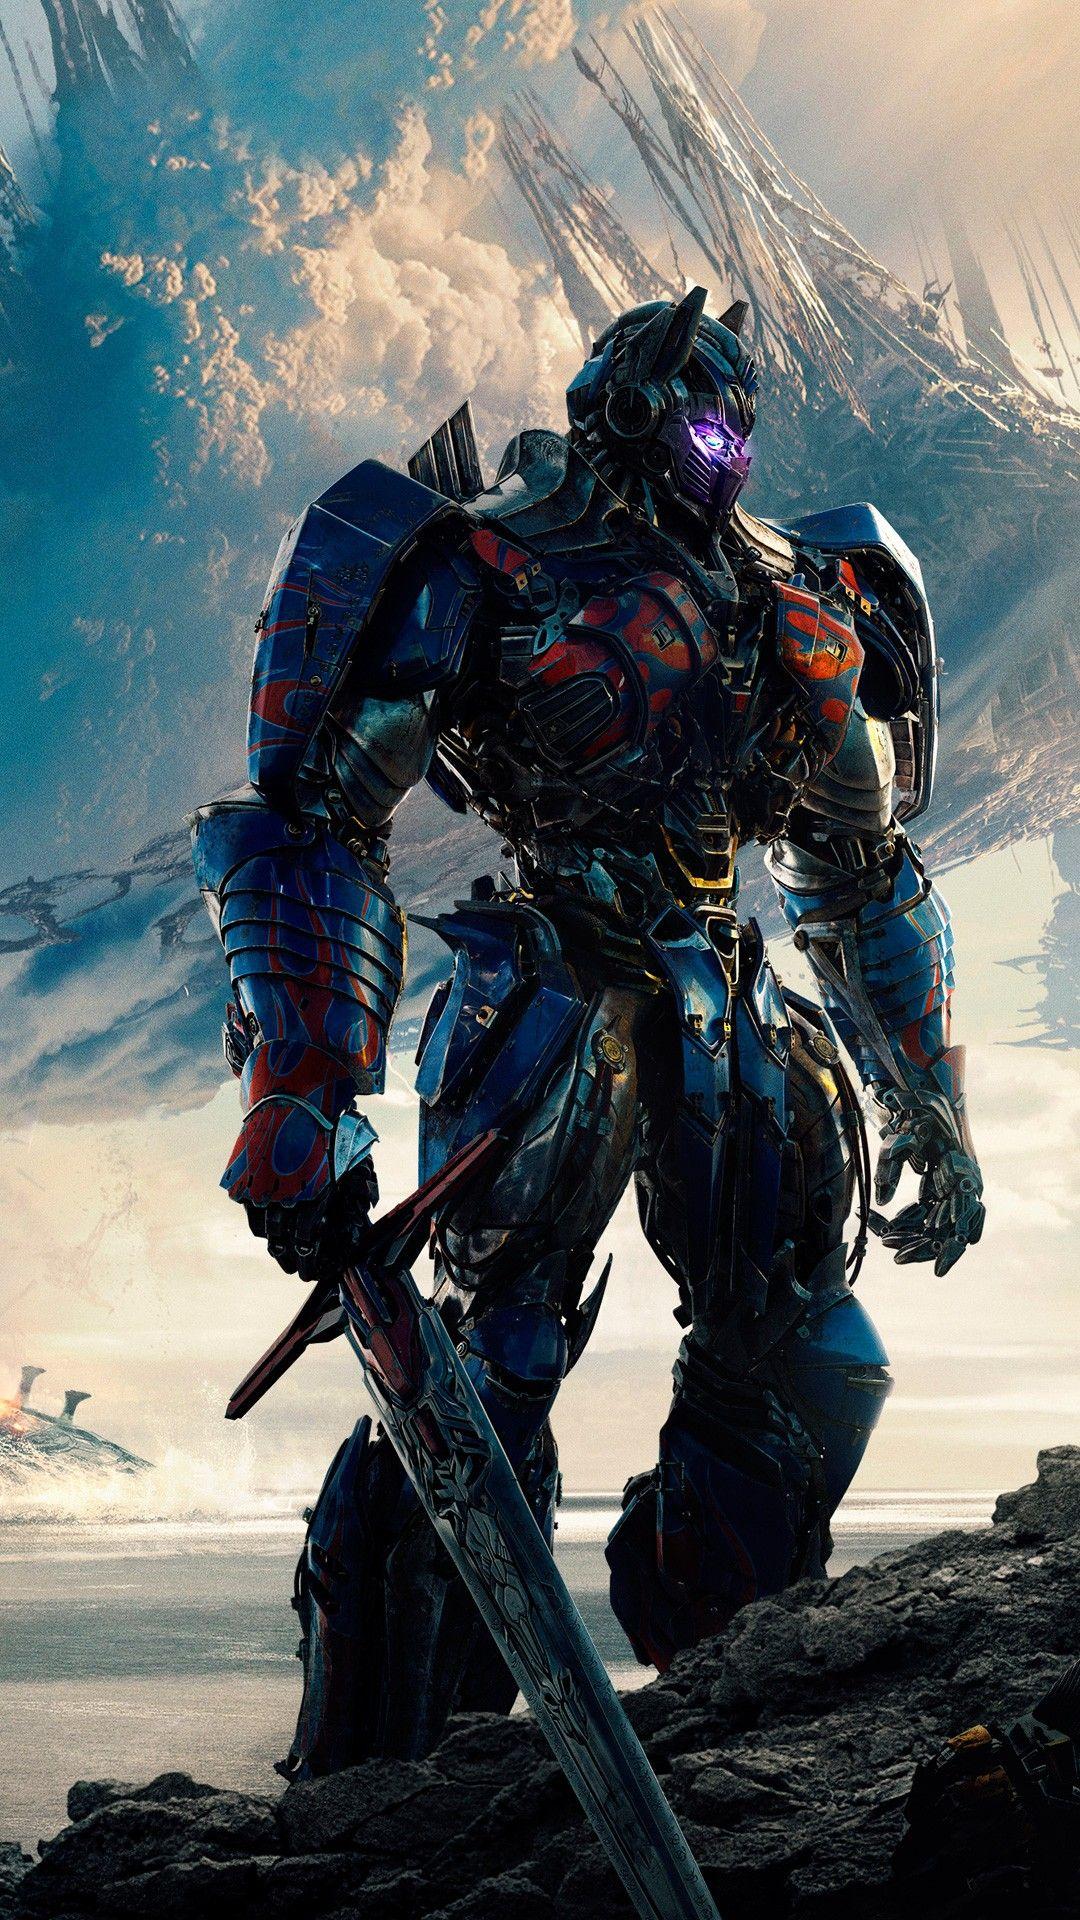 Optimus Prime Transformers The Last Knight Wallpapers Hd Wallpapers Optimus Prime Wallpaper Optimus Prime Wallpaper Transformers Transformers Movie